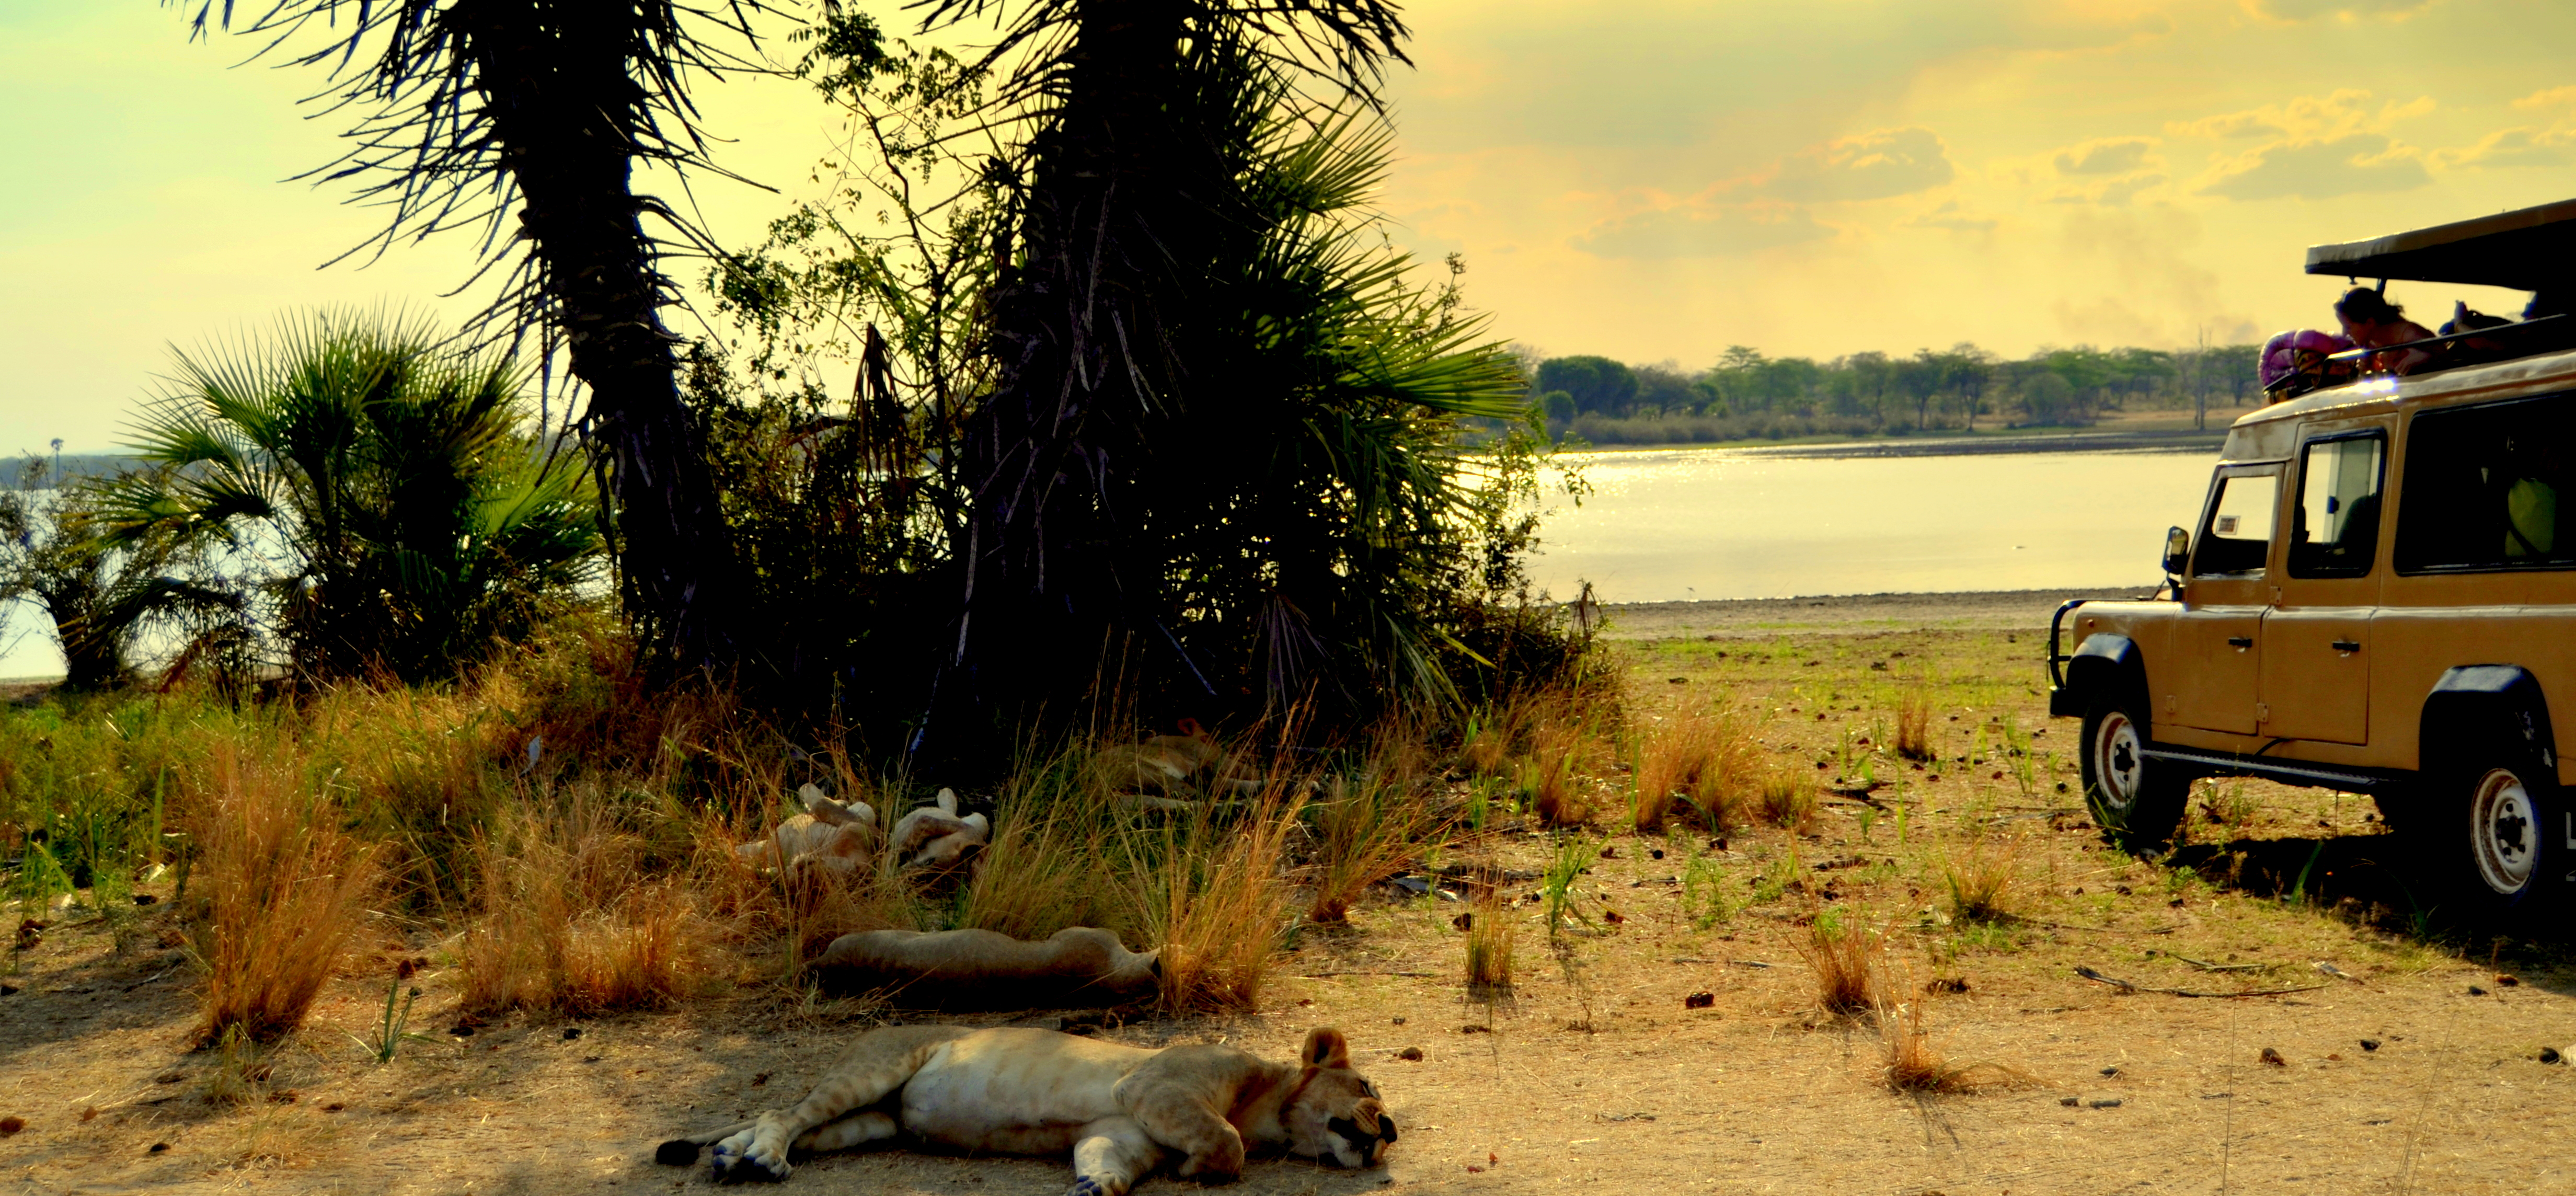 Leones safari sur de Tanzania